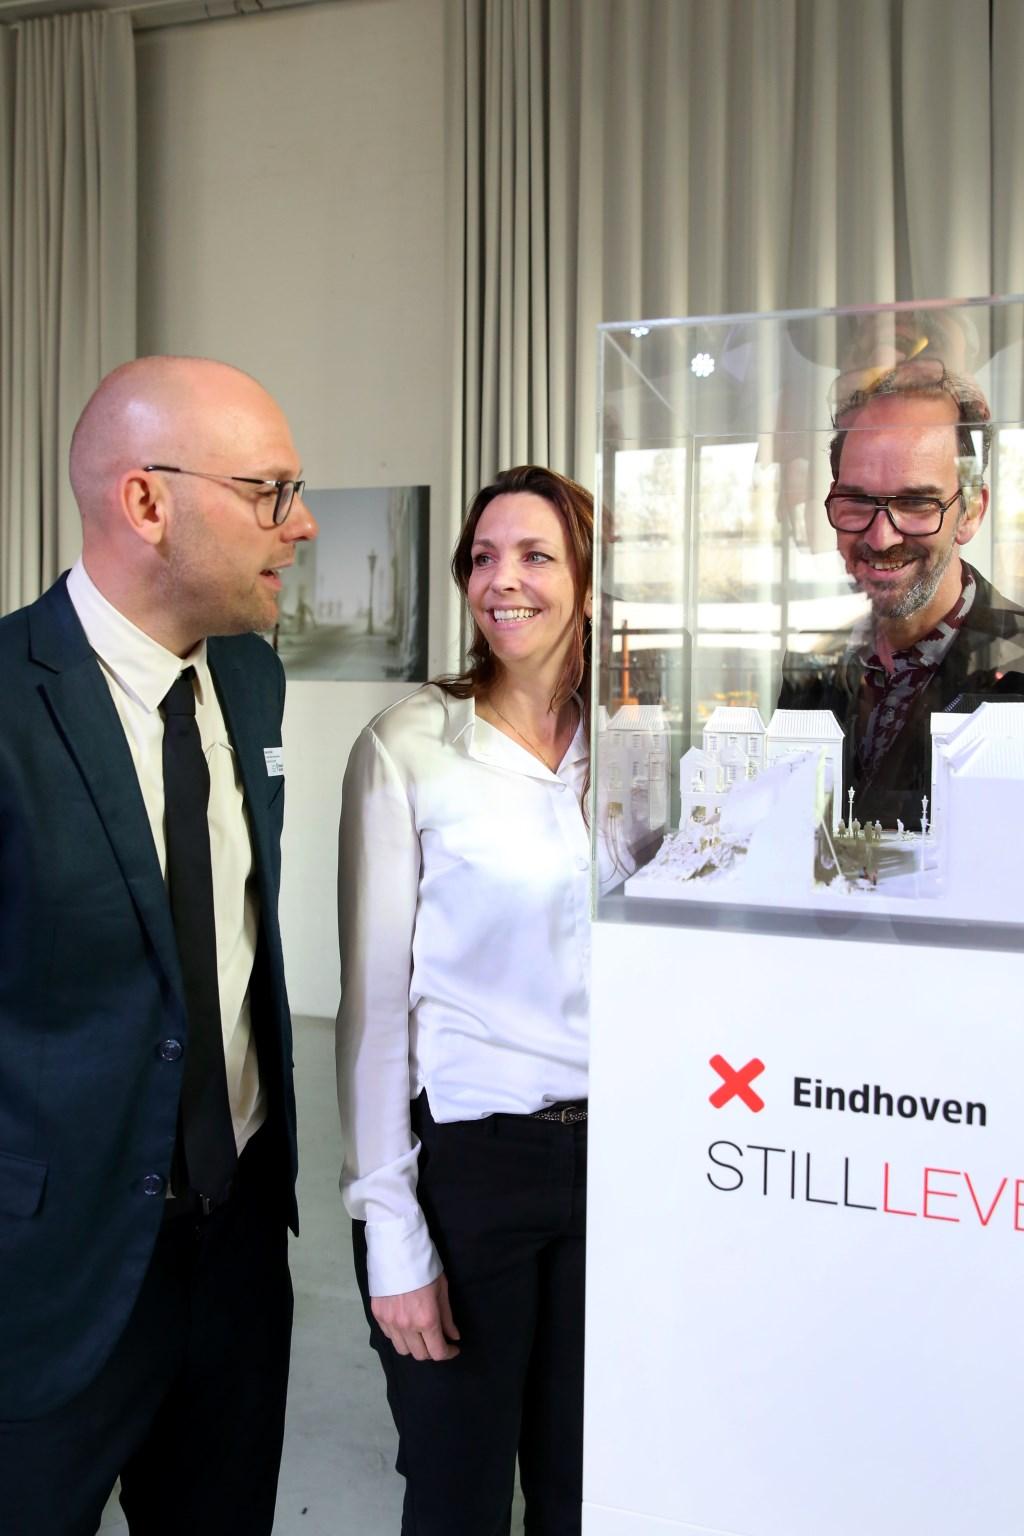 Henri Swinkels, Femke Klein en Rocco Verdult. FOTO: PHOTODETTE.NL Foto: photodette.nl © DPG Media